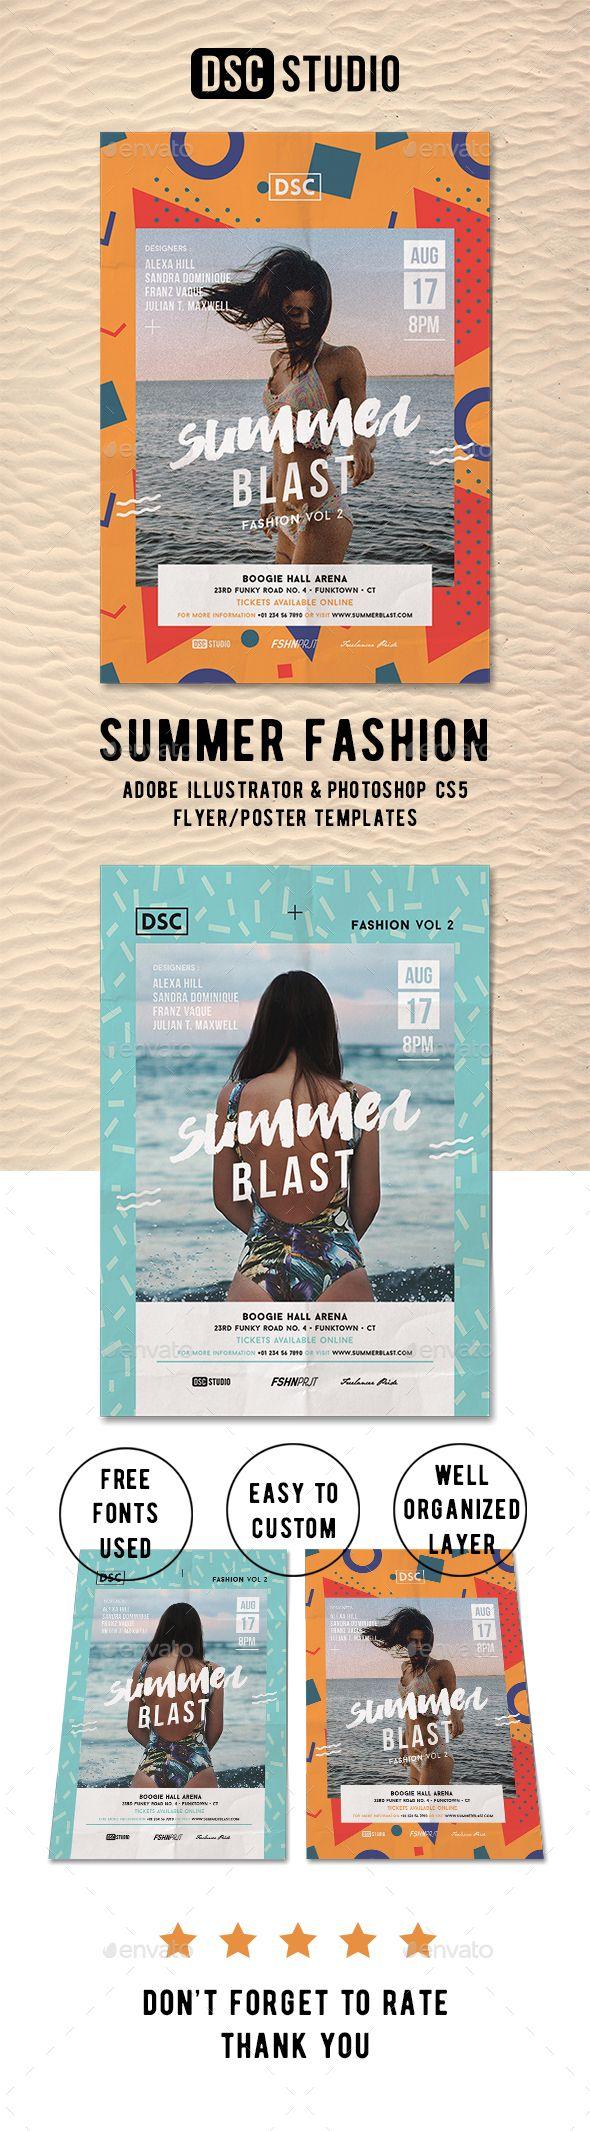 Summer Fashion Flyer Template PSD, AI Illustrator. Download here: https://graphicriver.net/item/summer-fashion-flyer/17348034?ref=ksioks